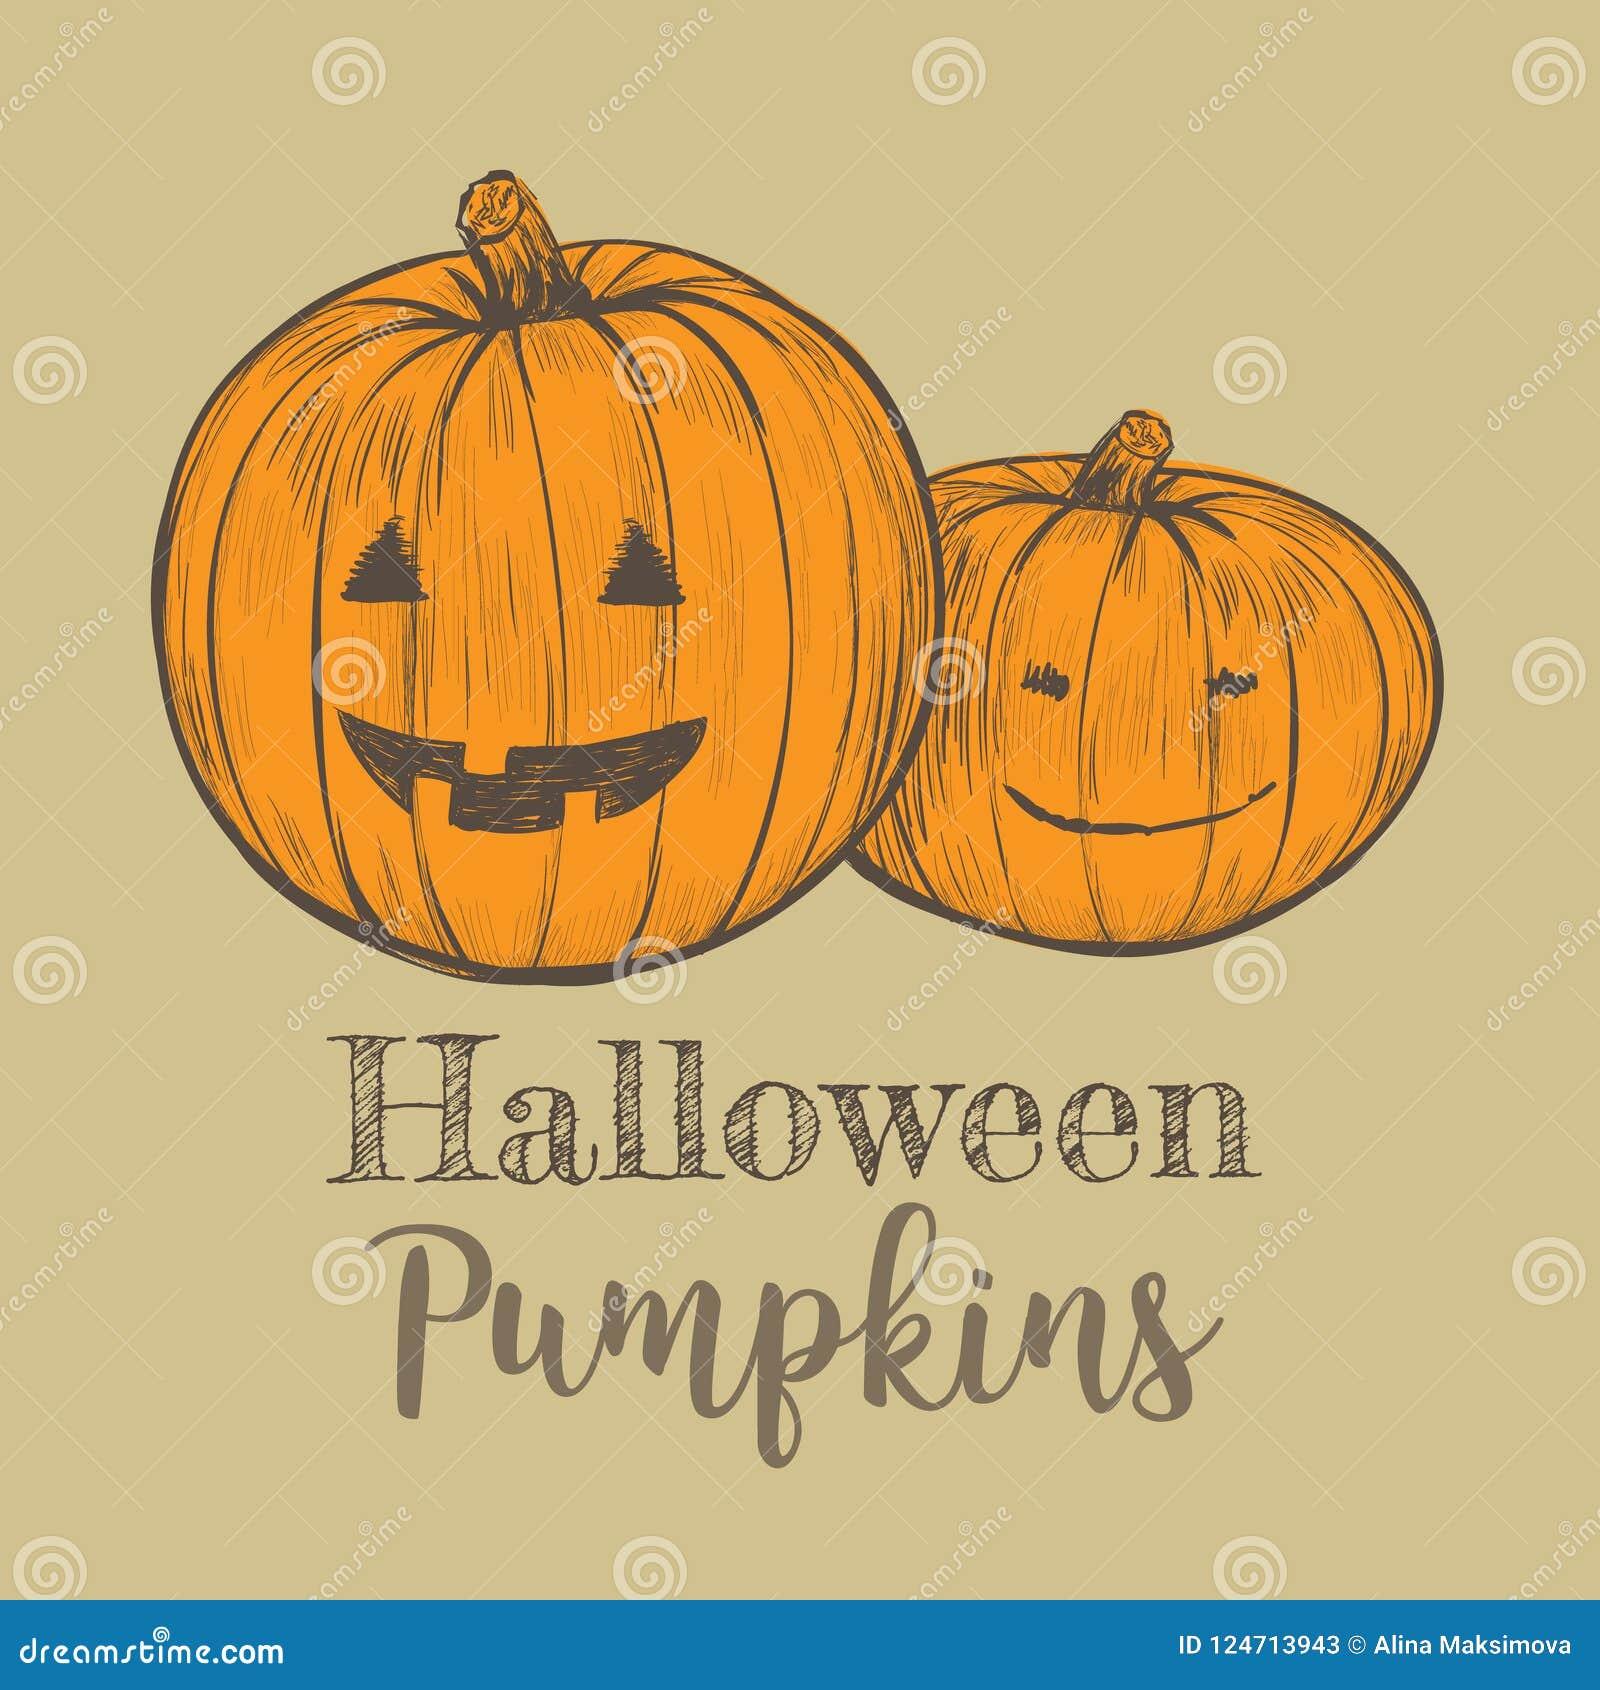 Halloween Pumpkin Vector.Halloween Pumpkin Vector Illustration Stock Vector Illustration